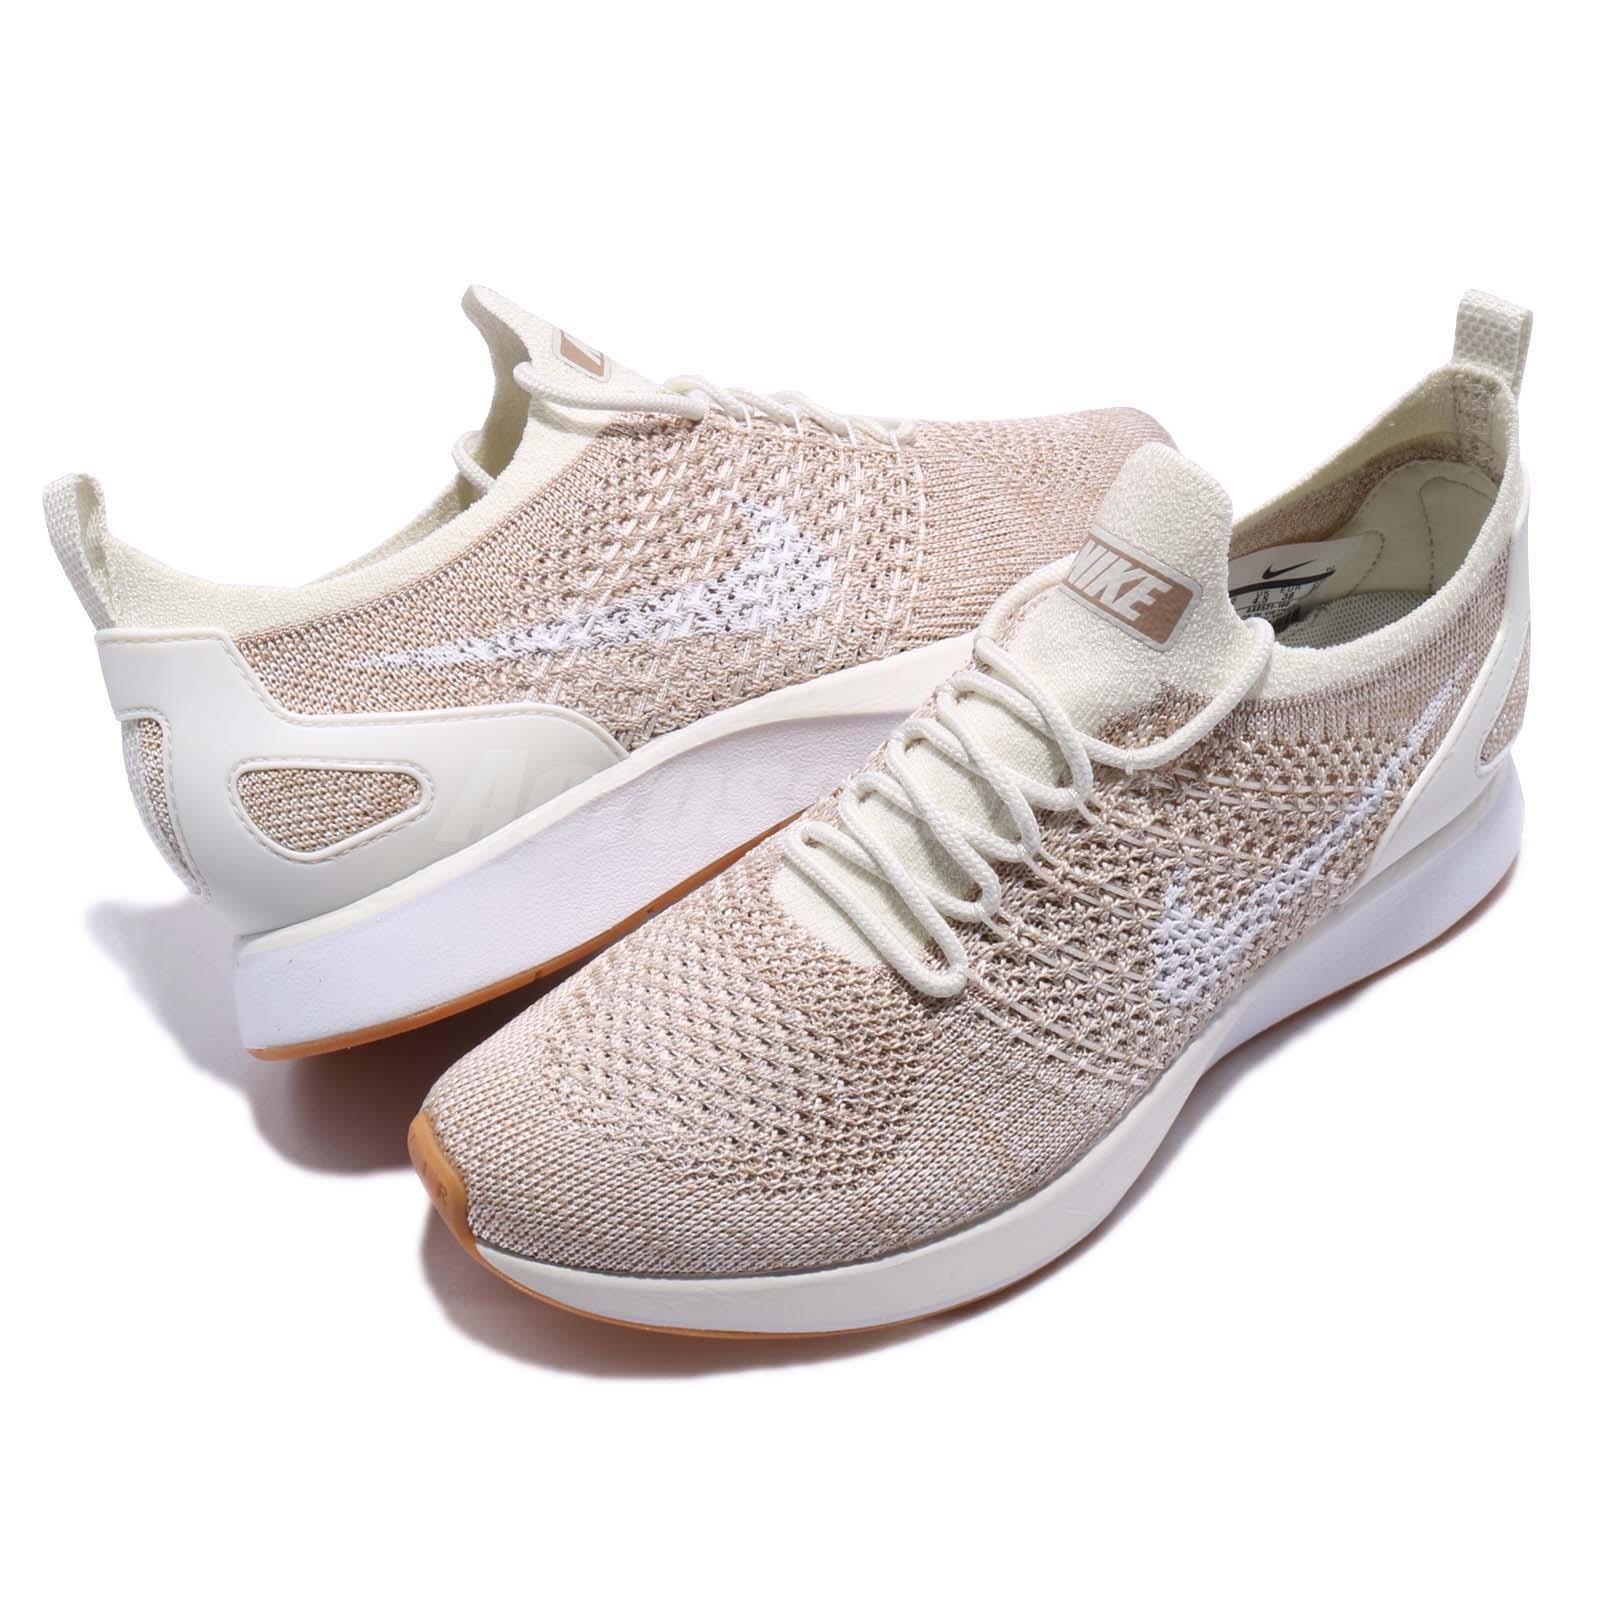 ecd077af1c1c3 Nike Wmns Air Zoom Mariah FK Racer Flyknit Sail Sand Women Running ...